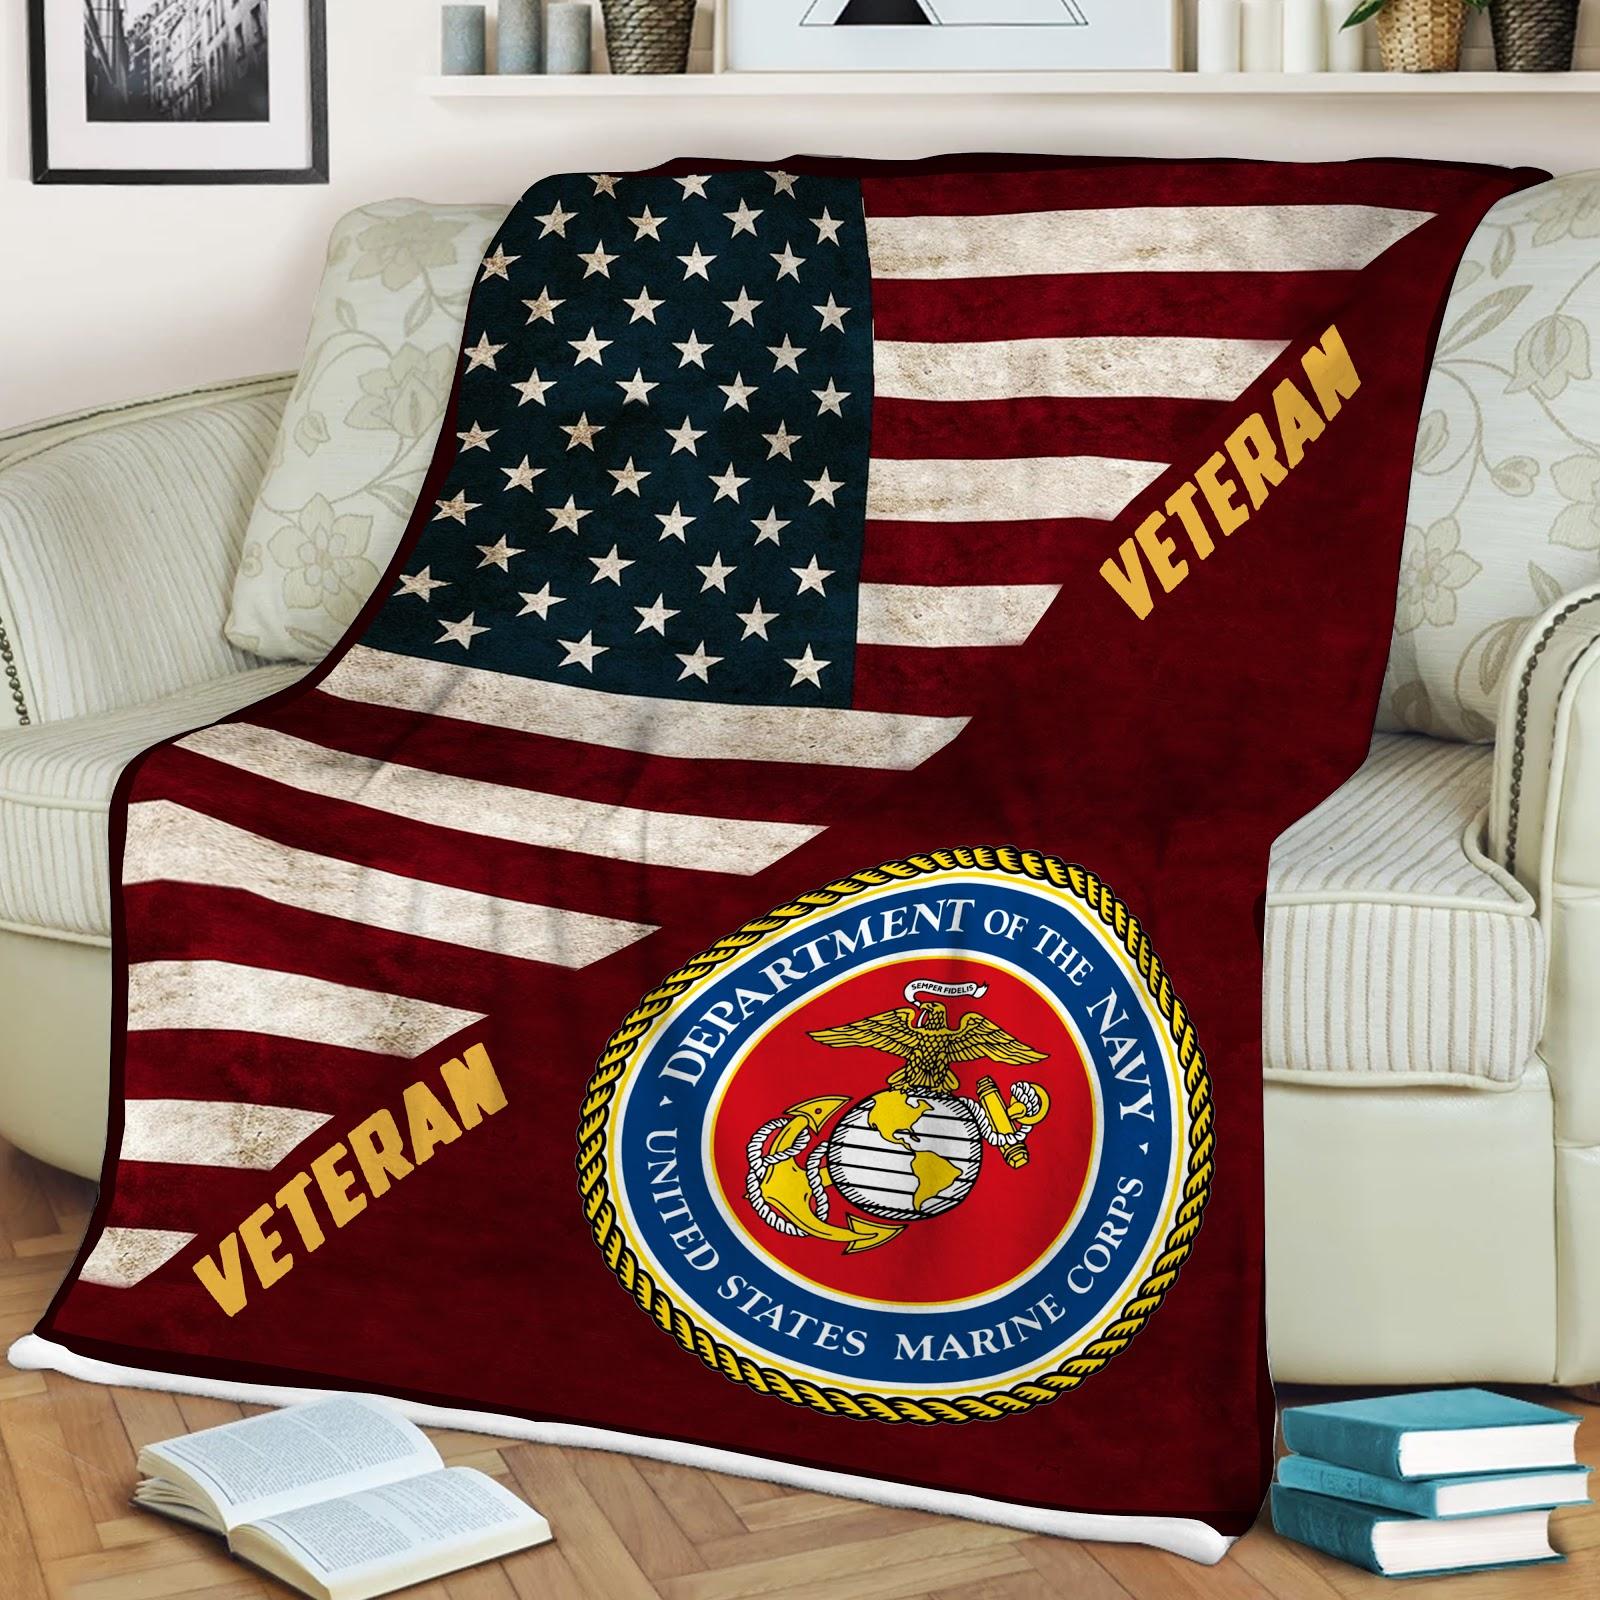 Veteran of marine full printing blanket 1